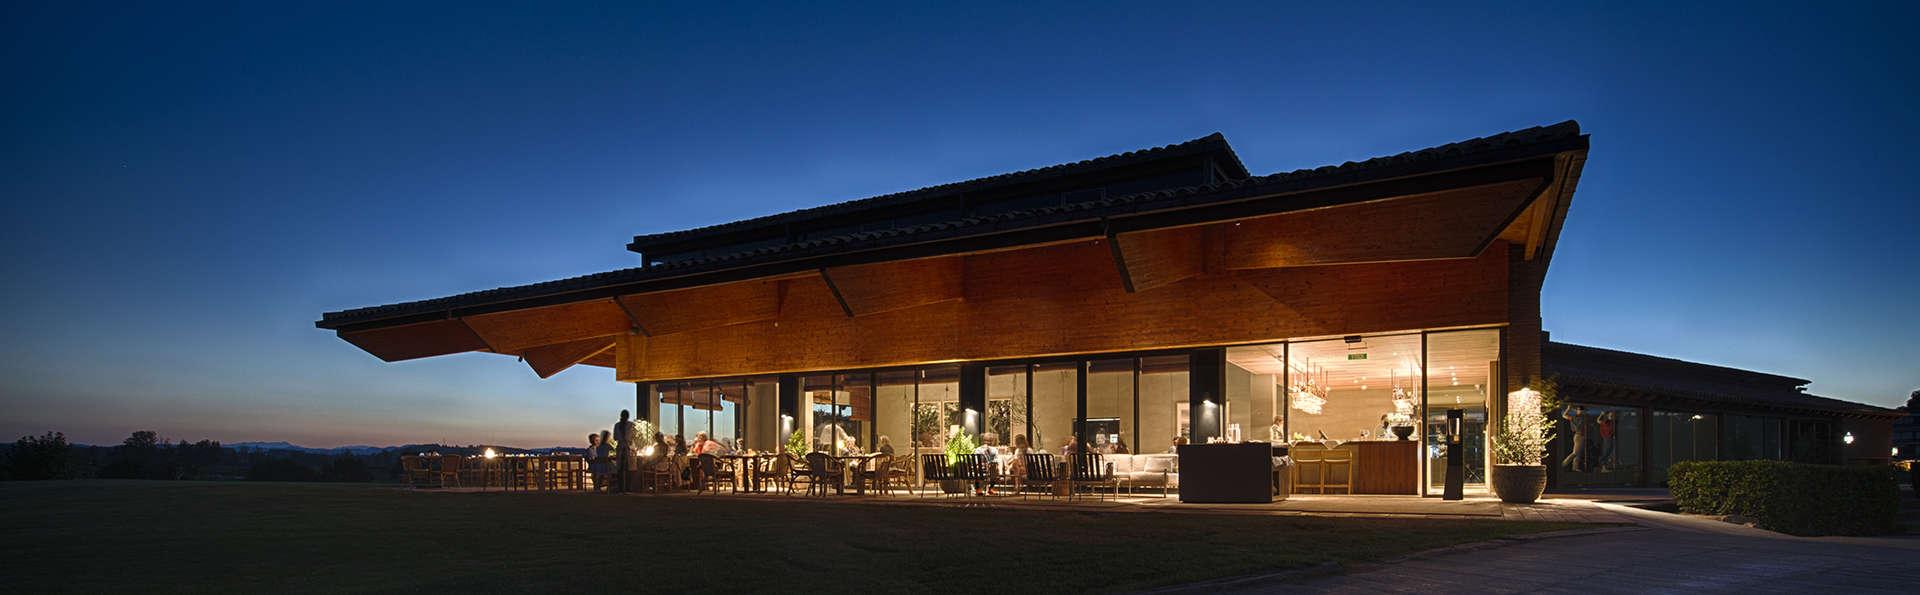 Hotel Empordà Golf - EDIT_TERRAVERDAGOLFCLUB_FRONT_NIGHT.jpg